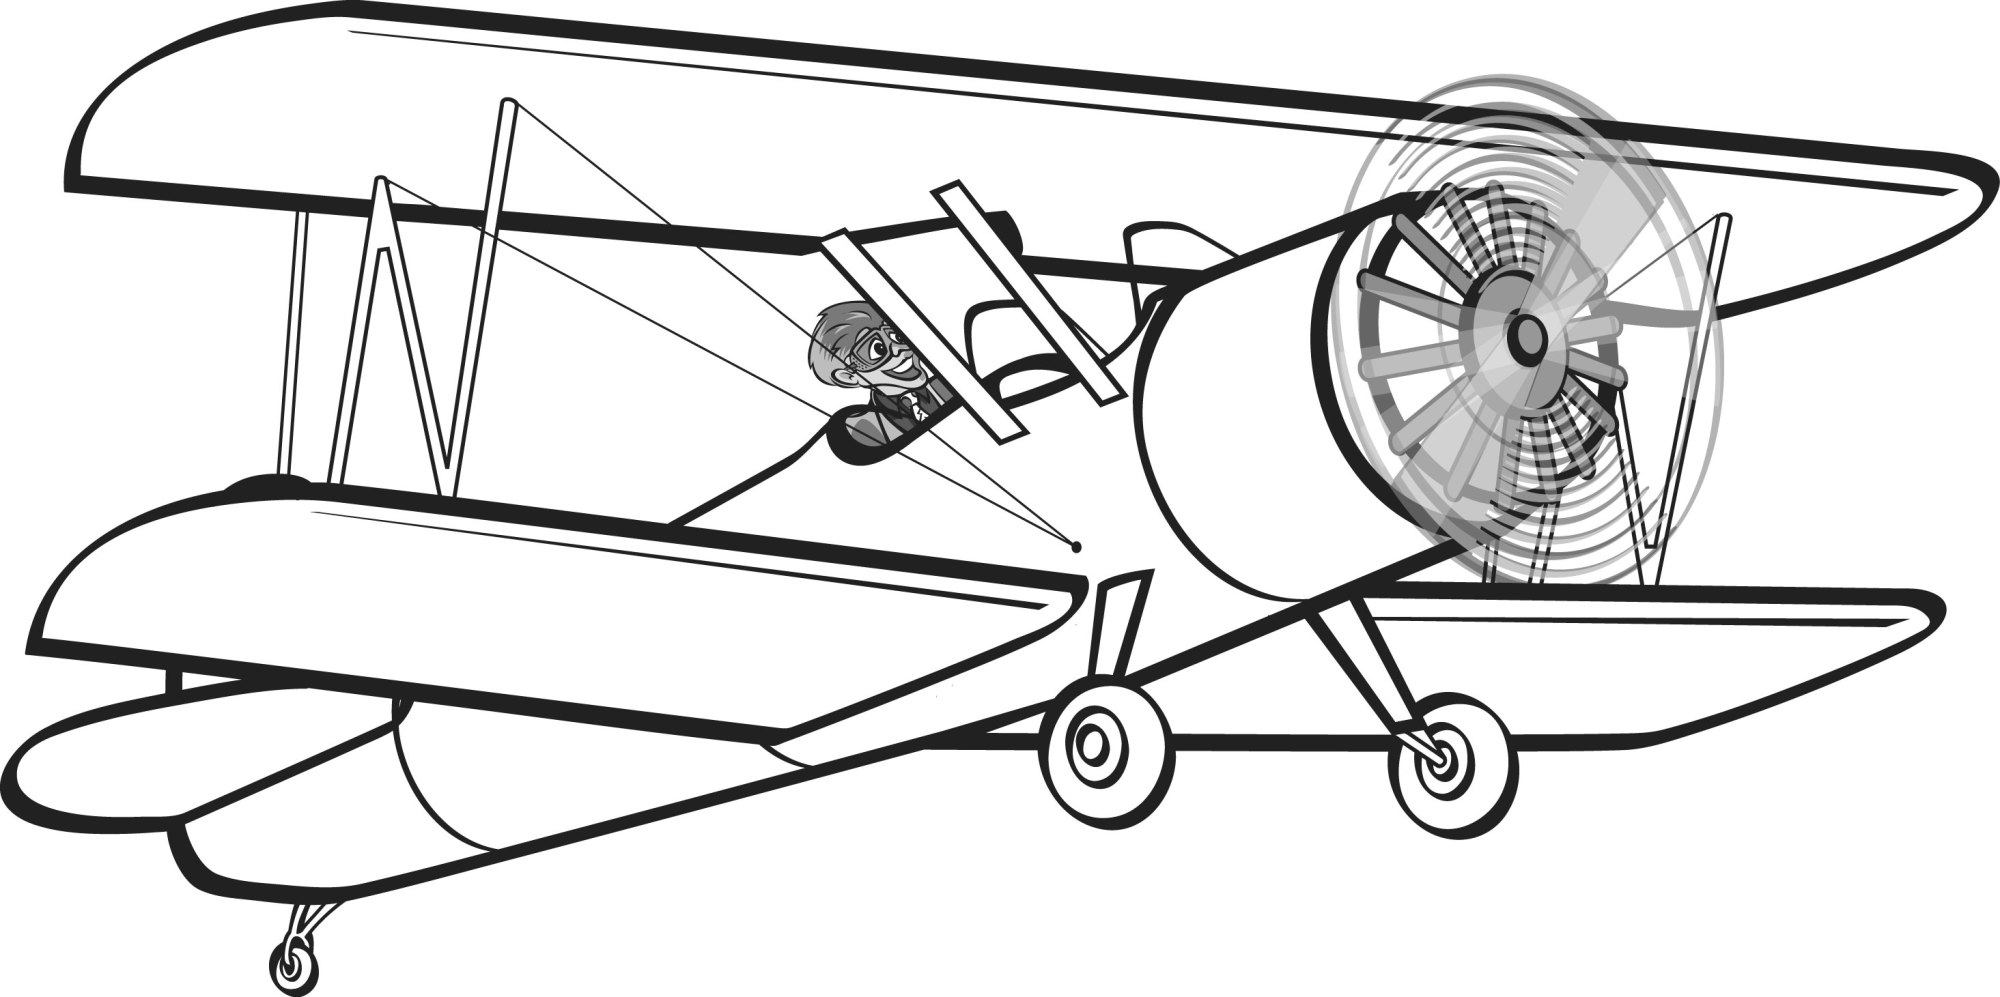 hight resolution of 2929x1461 aviation clipart biplane